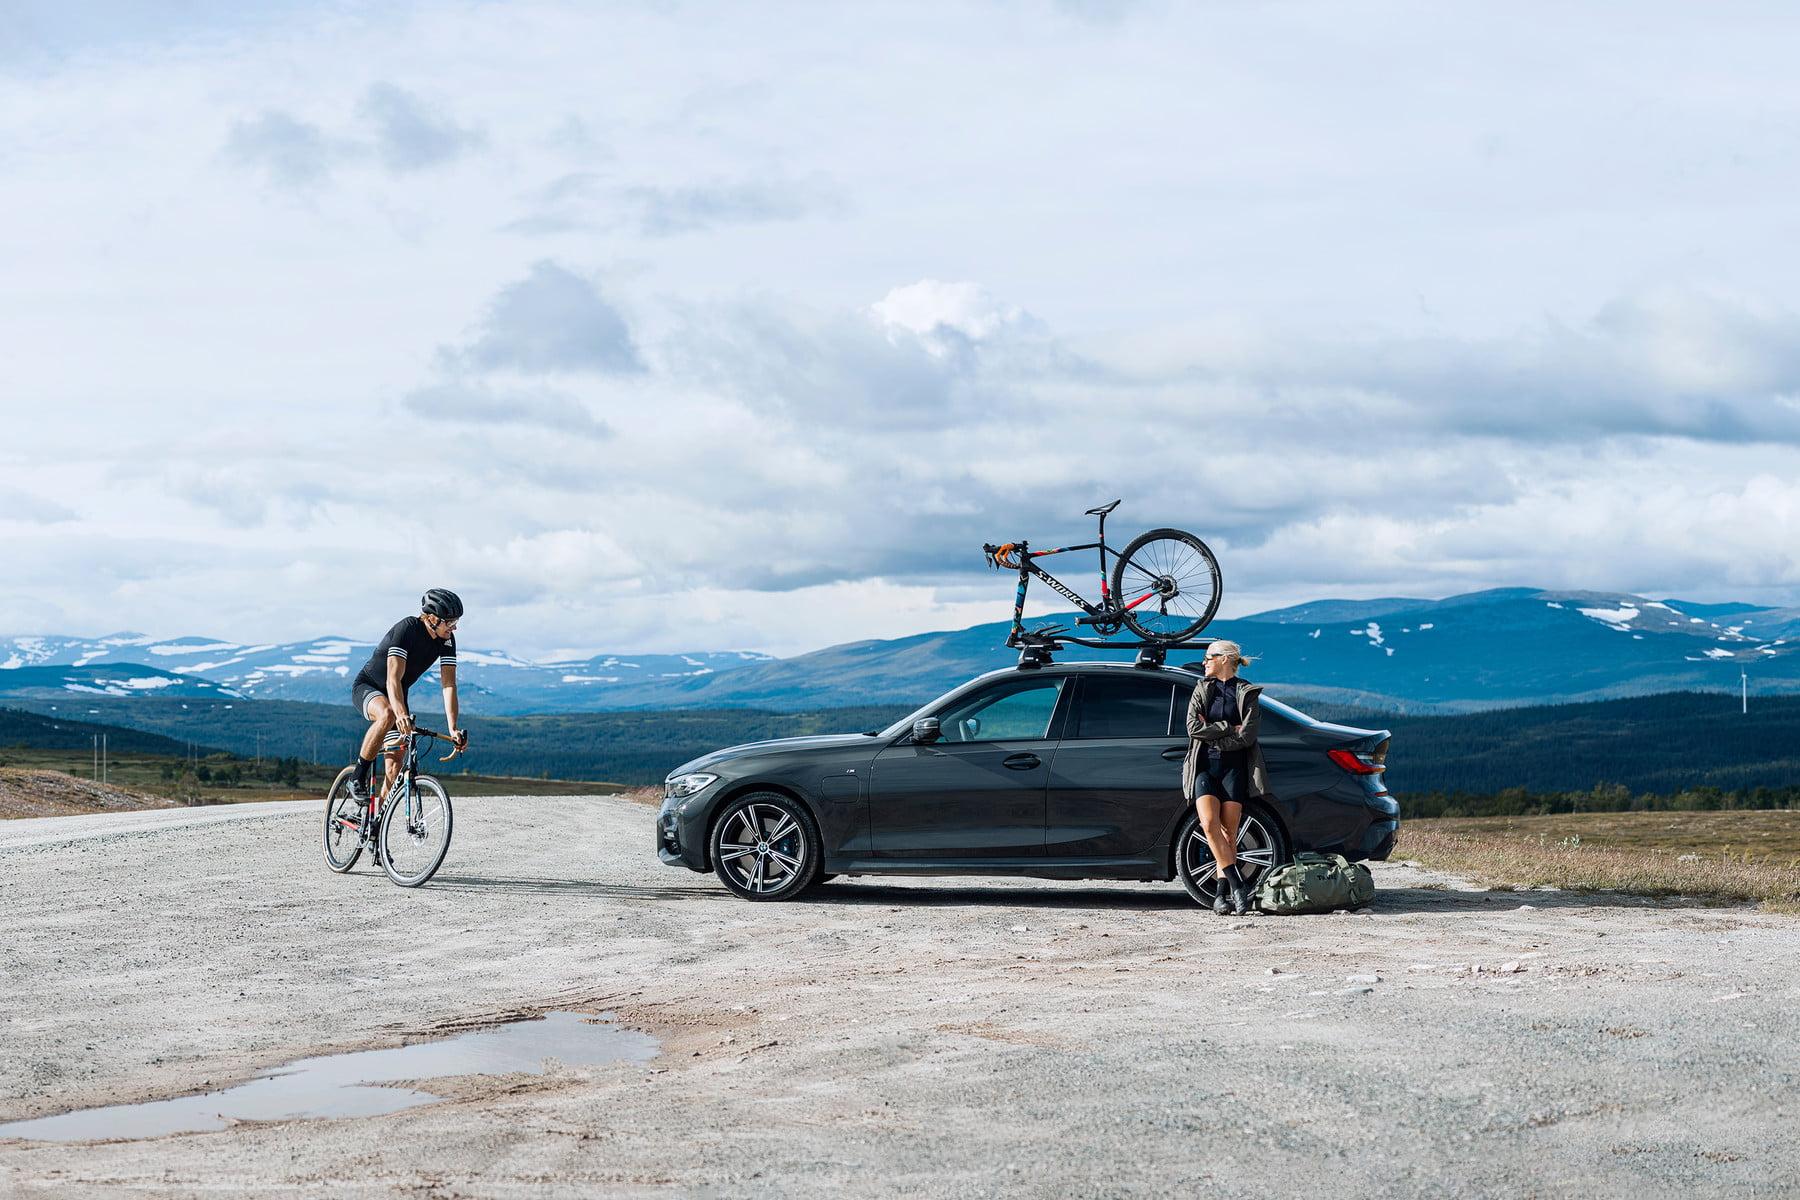 Suport biciclete Thule TopRide cu prindere pe bare transversale 3